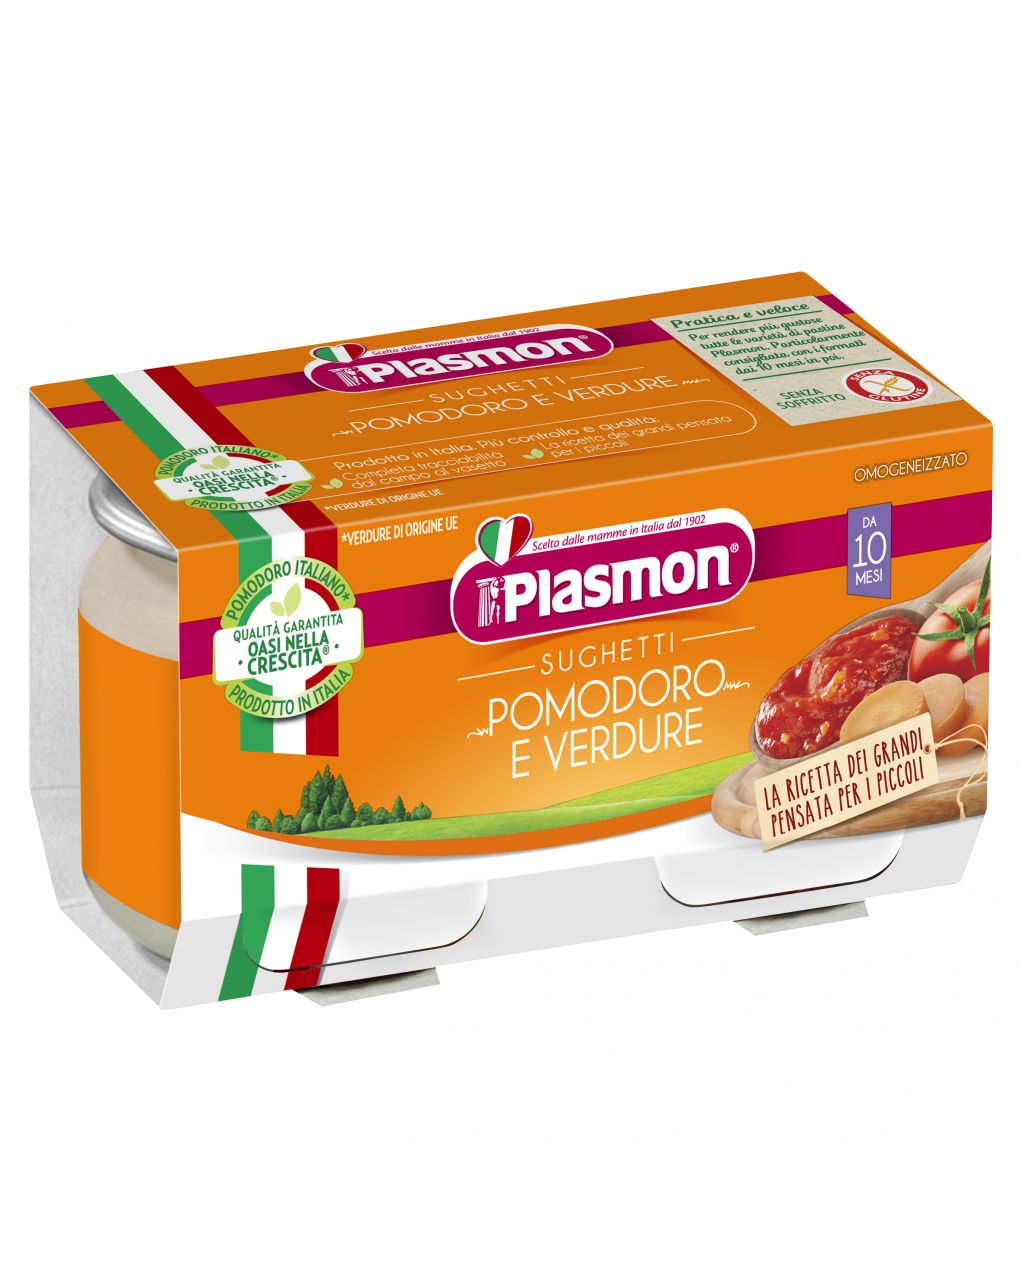 Plasmon - sughetti pomodoro e verdure 2x80g - Plasmon